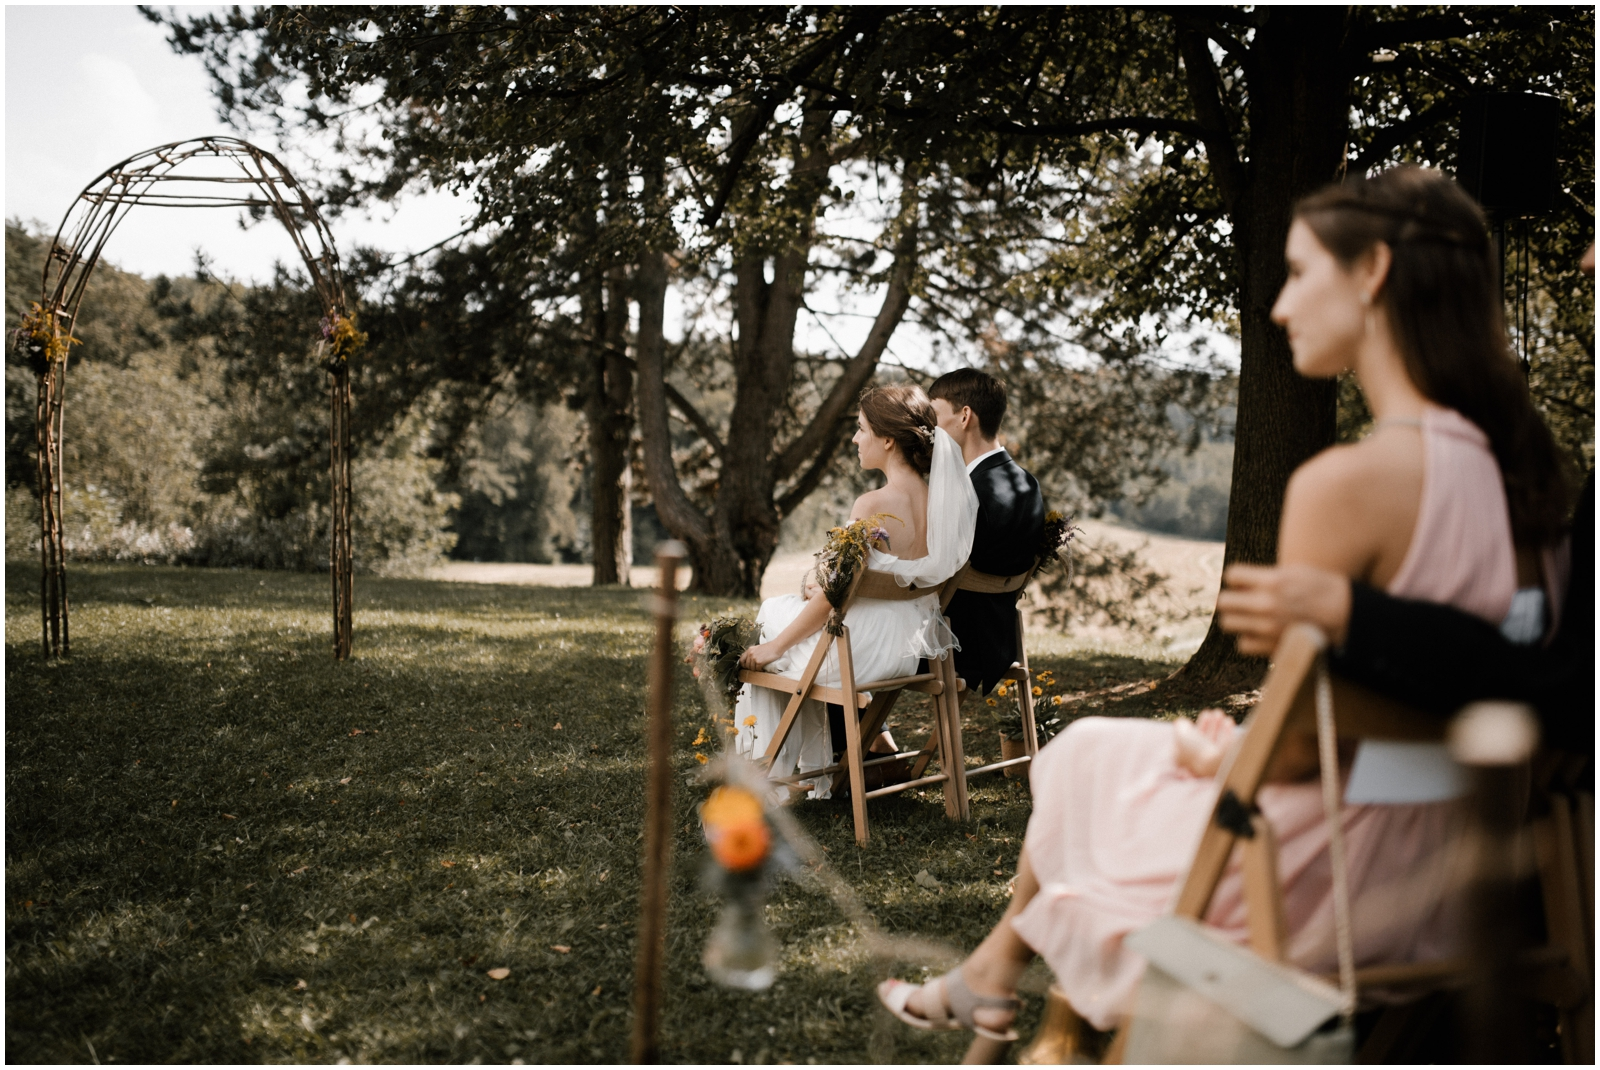 mirjam_thomas_wedding-359.jpg